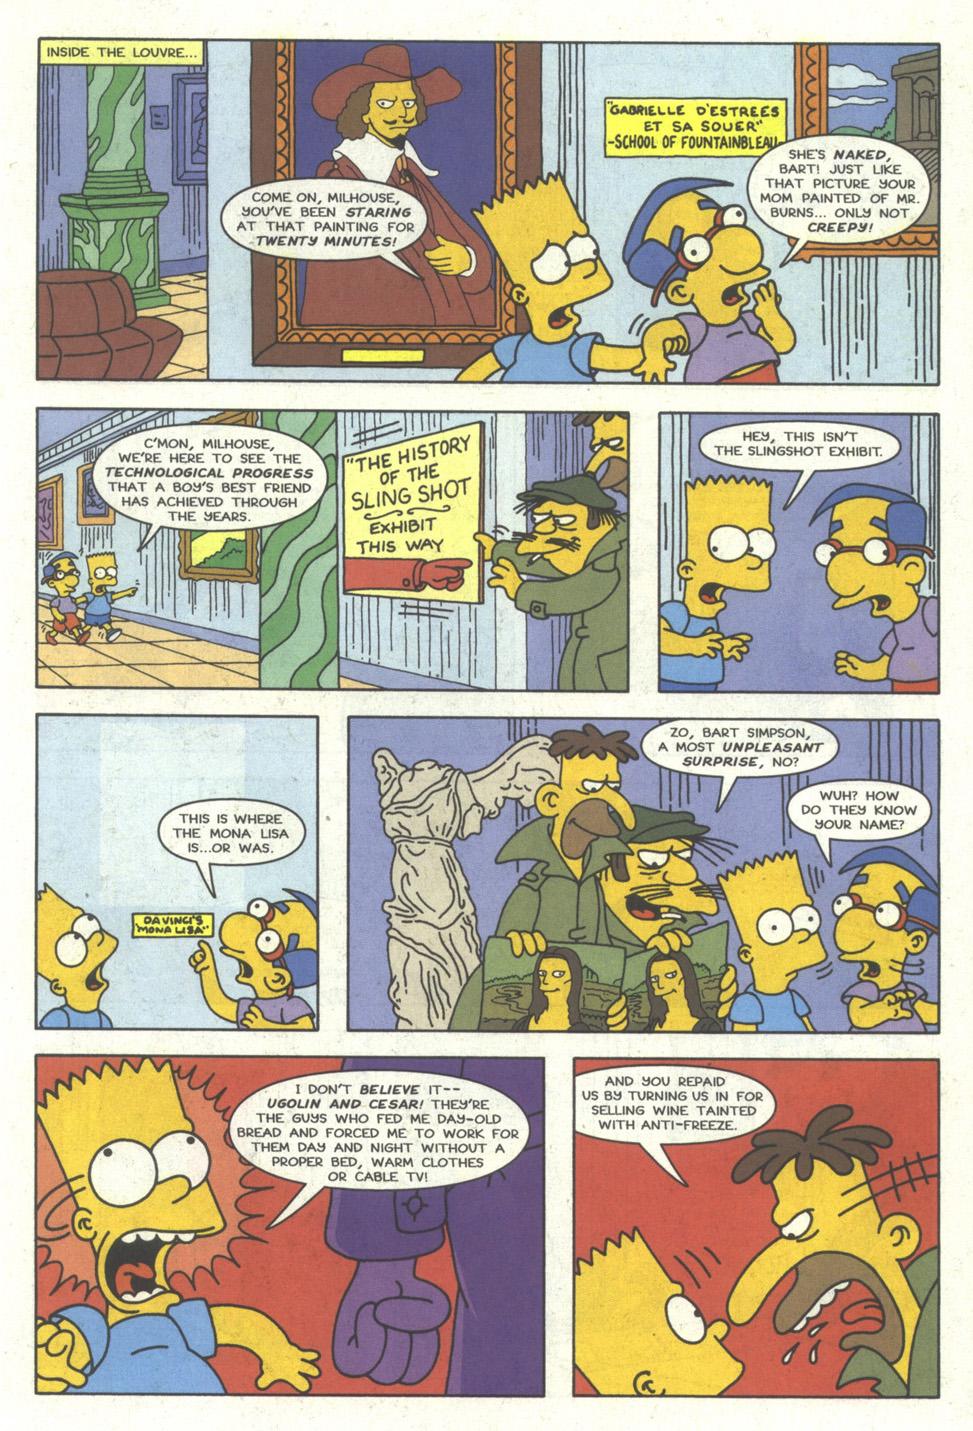 Read online Simpsons Comics comic -  Issue #23 - 14